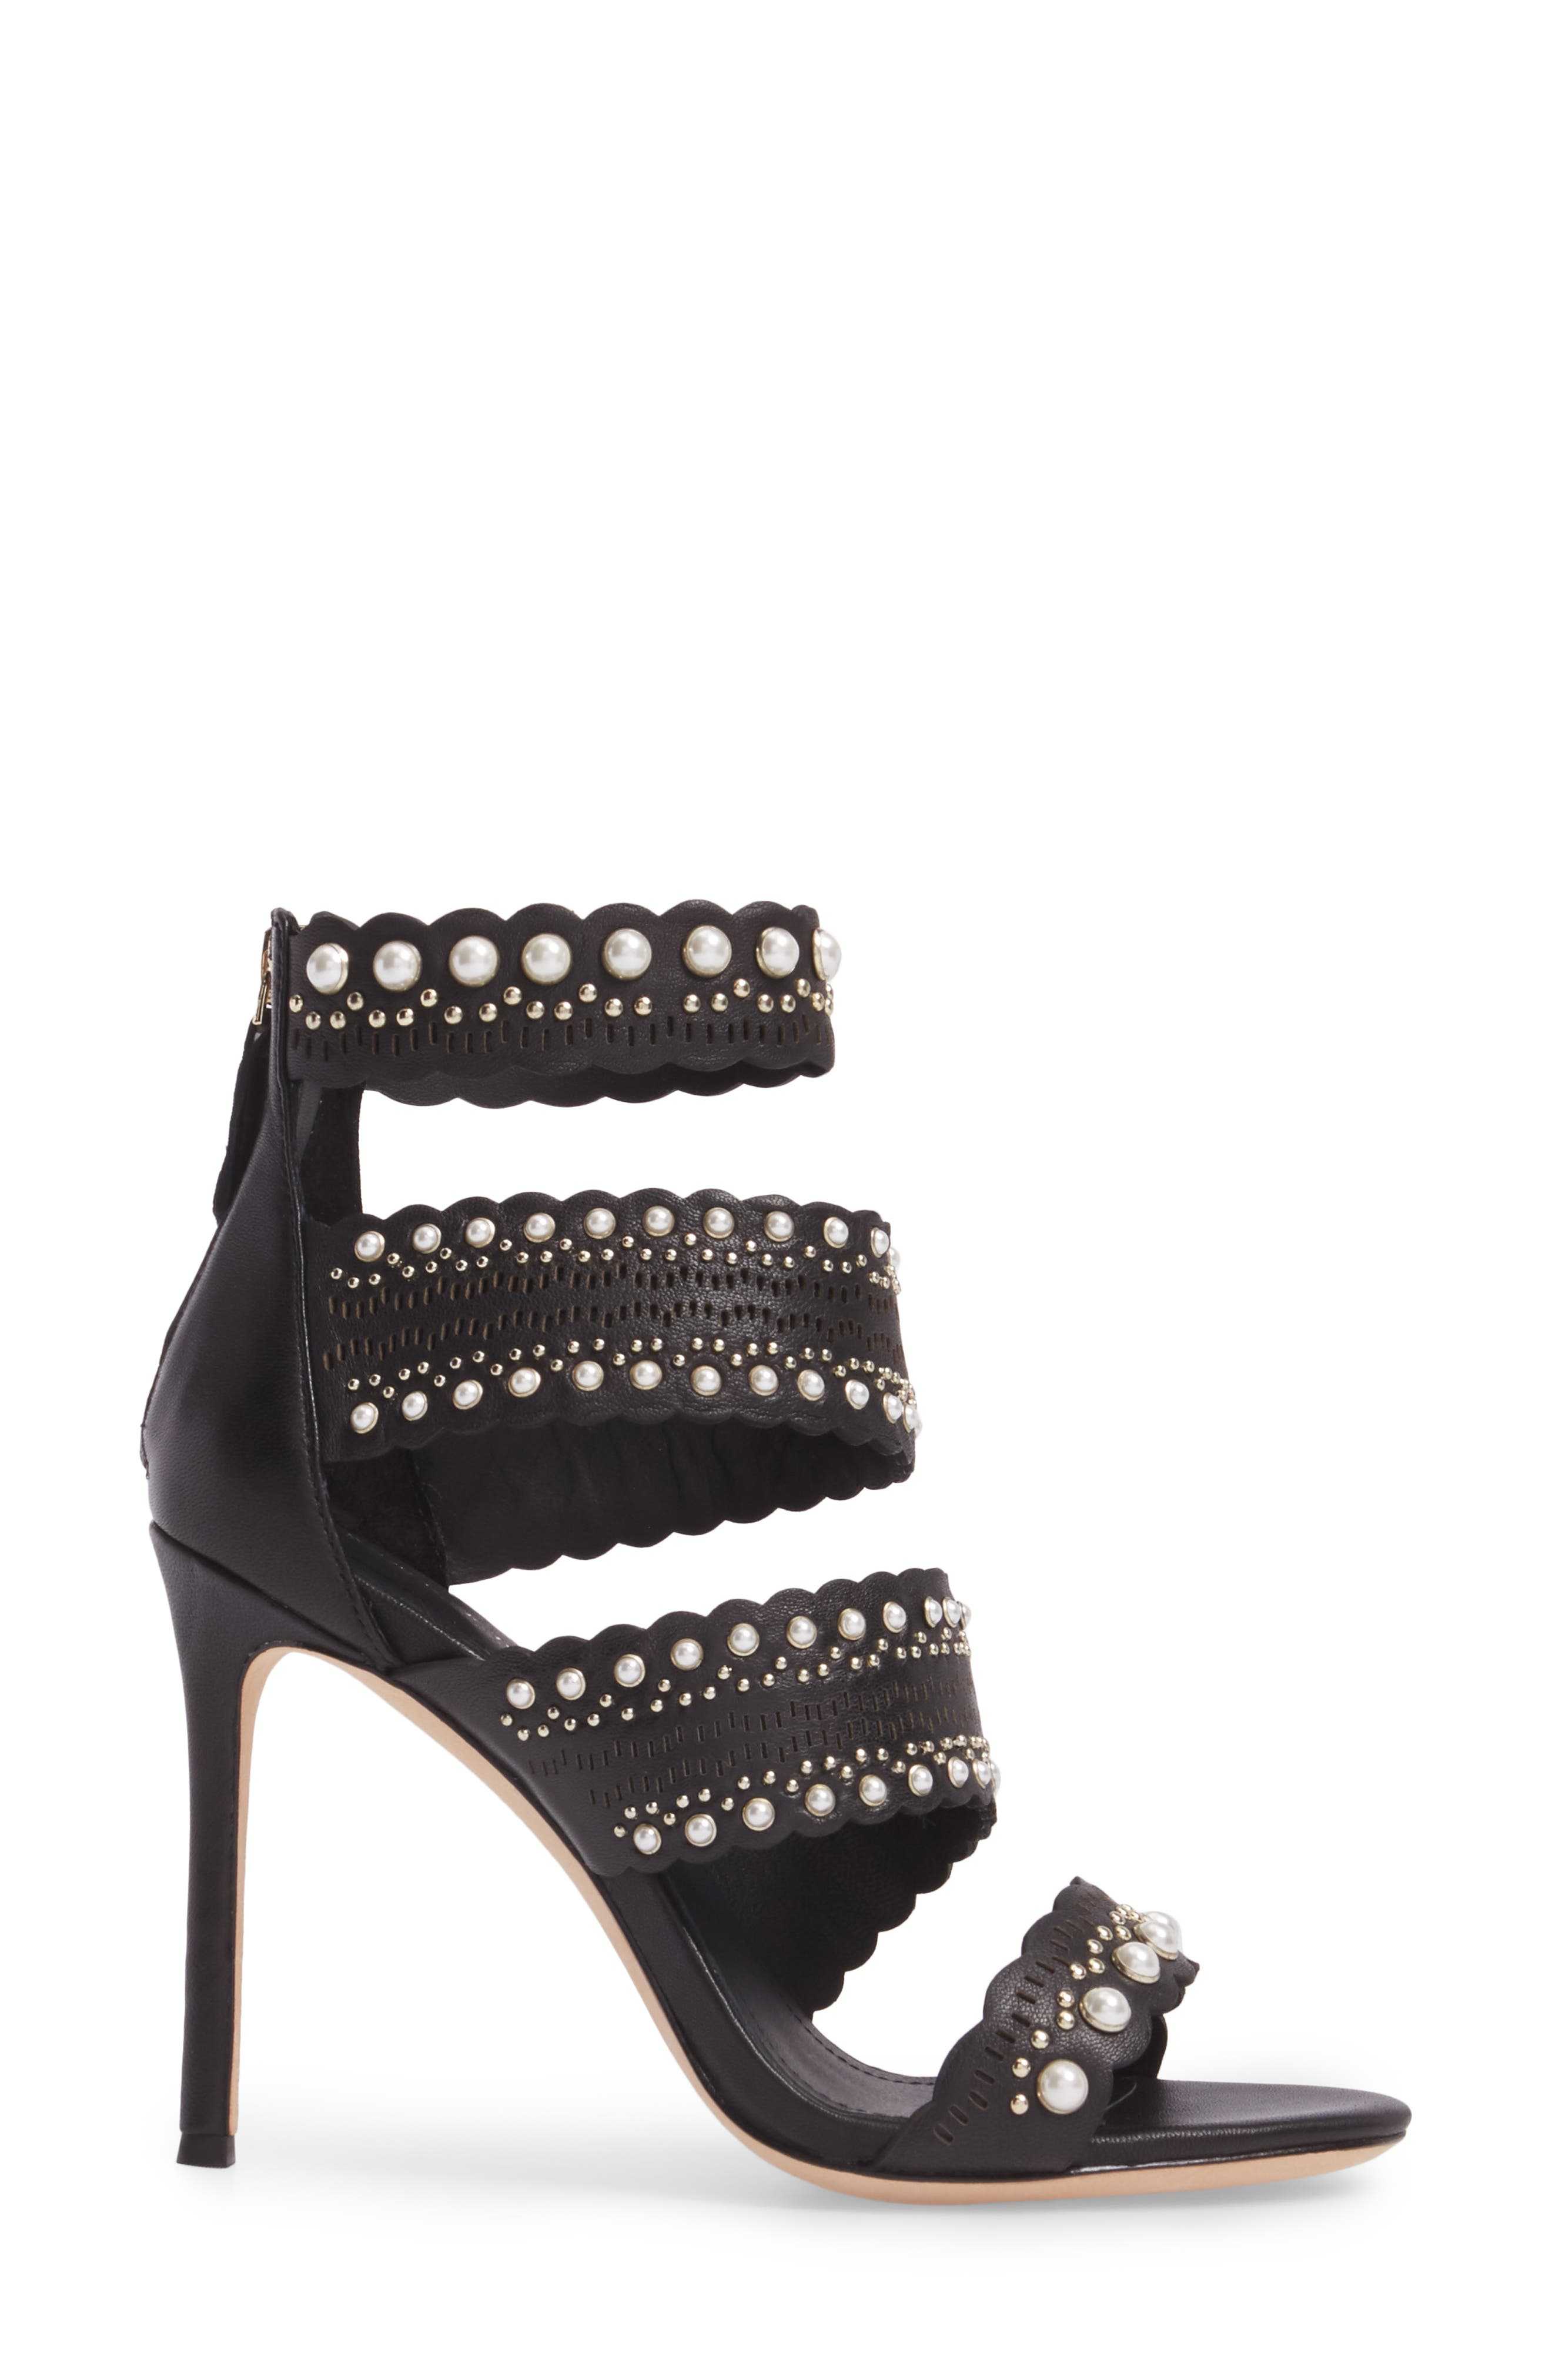 Ellura Scalloped Strap Sandal,                             Alternate thumbnail 3, color,                             Black Leather